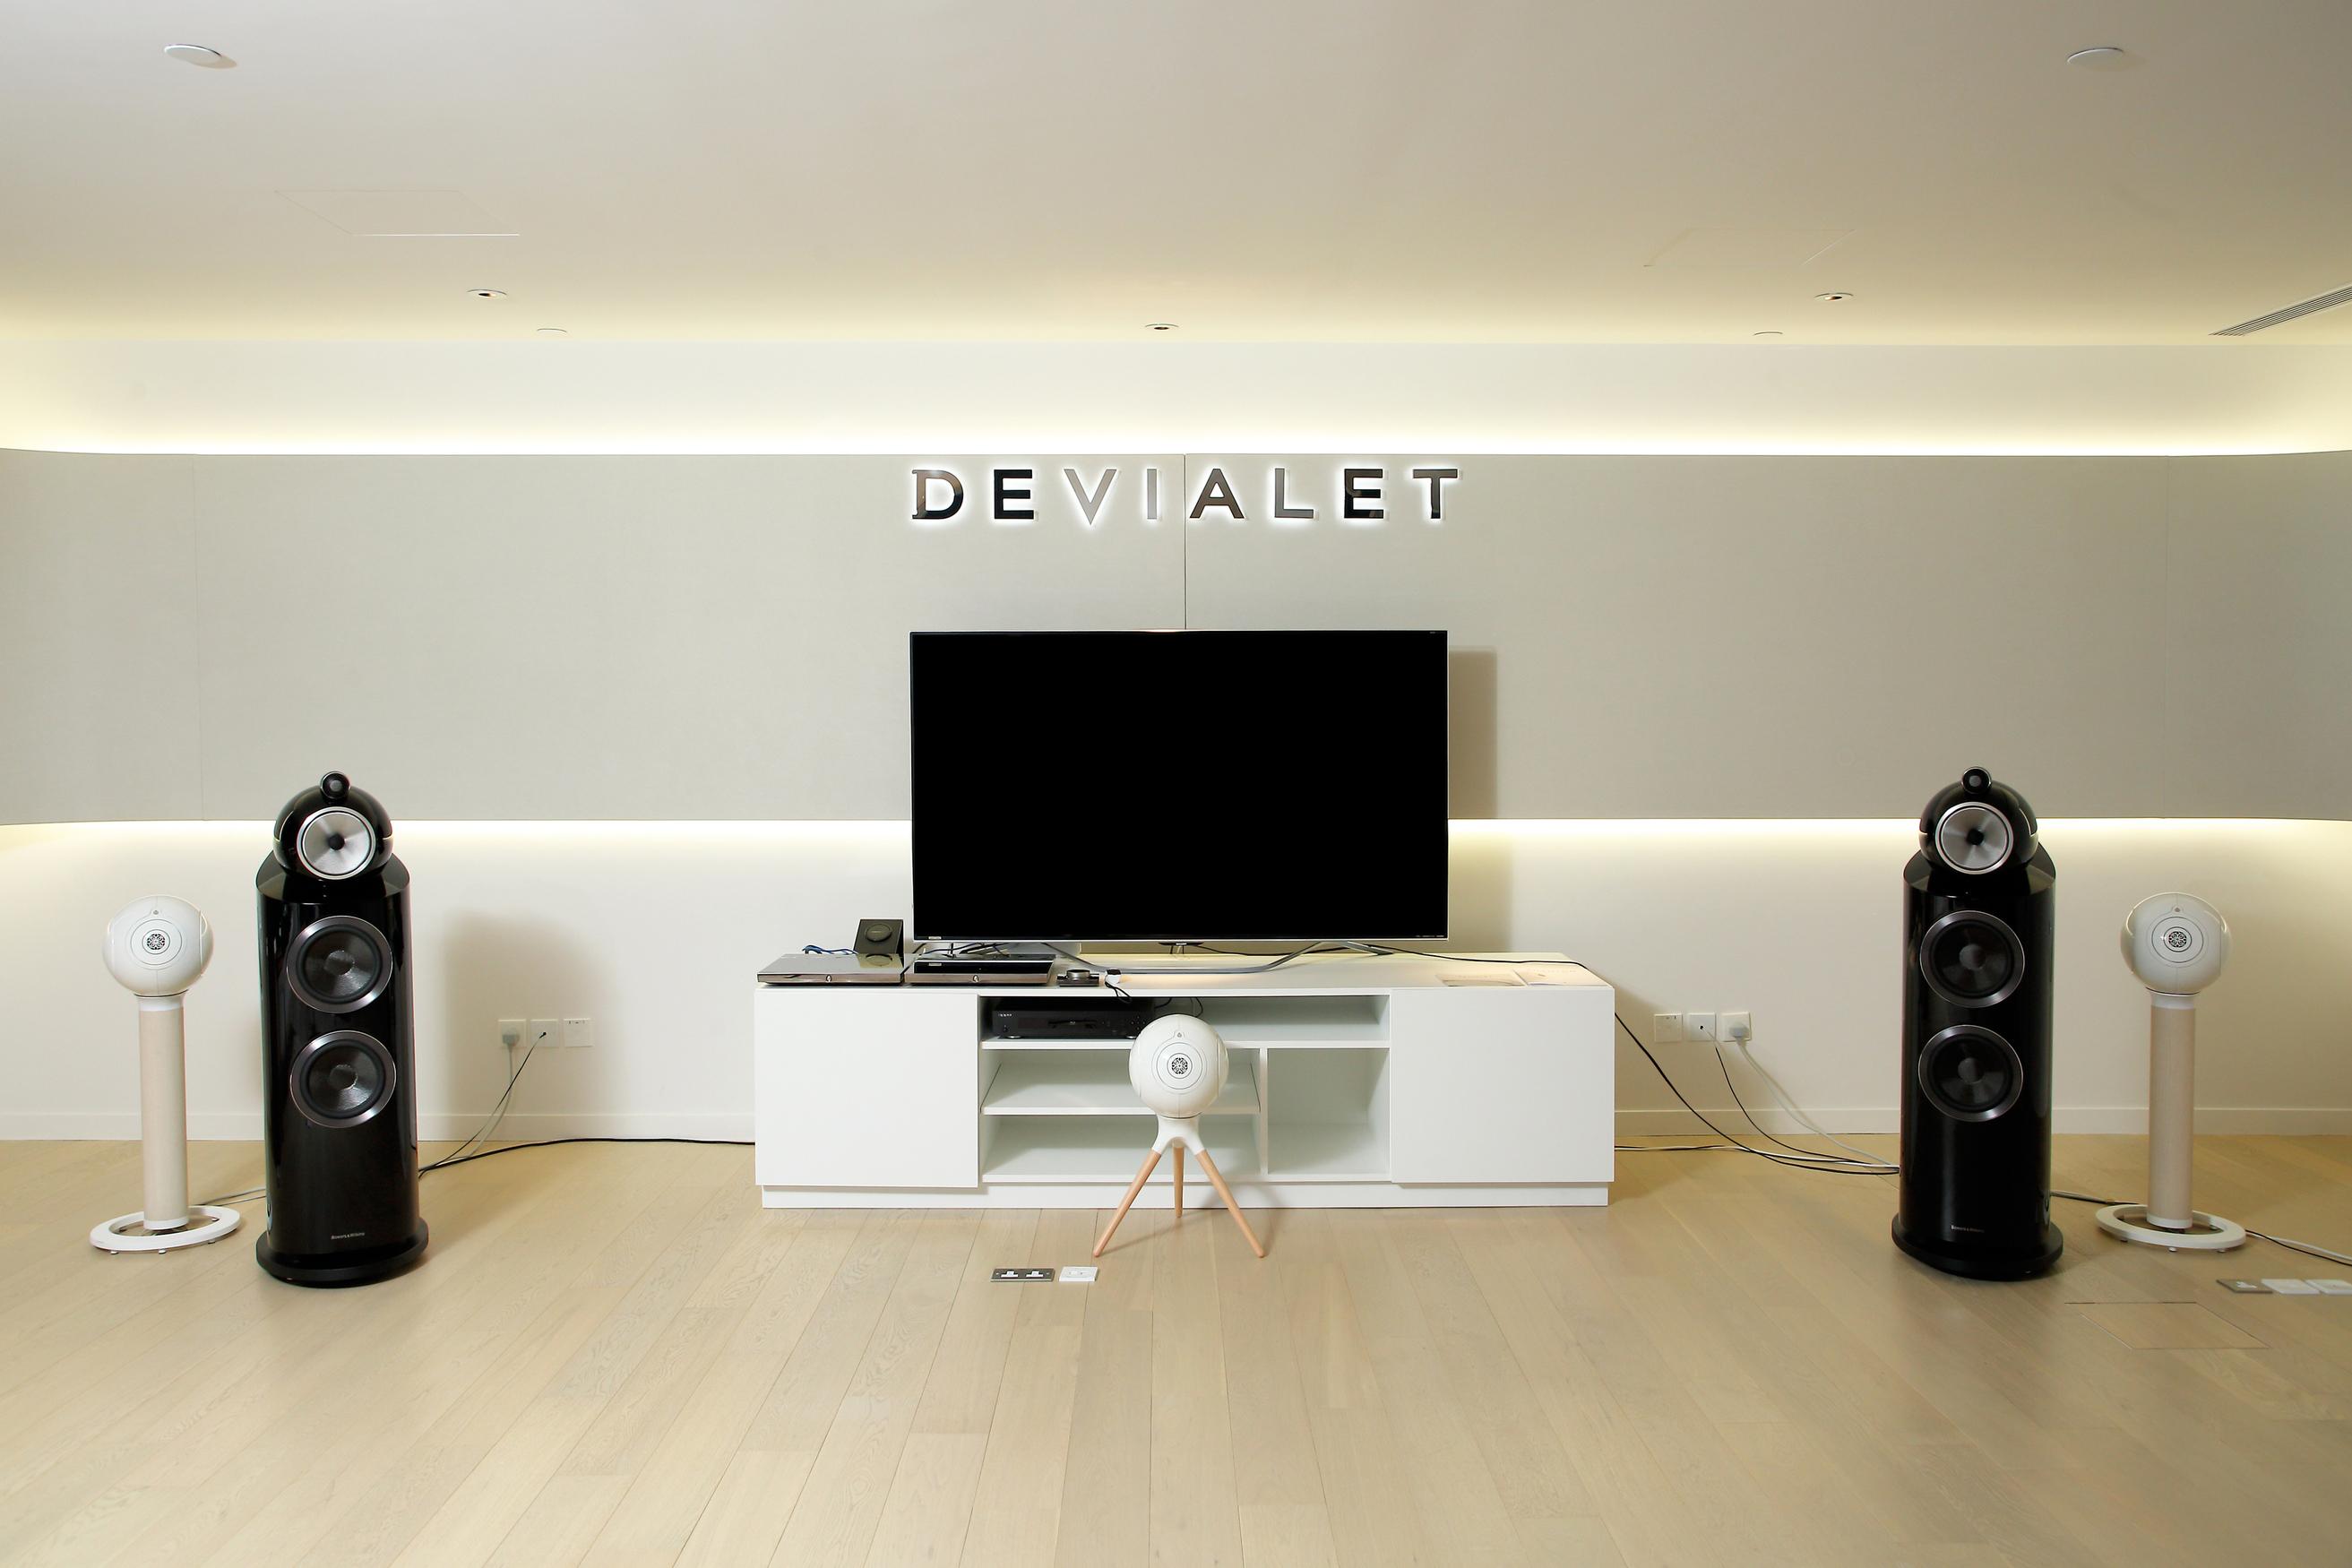 Devialet貴賓試聽室 The Devialet Private Lounge 追求極致音質